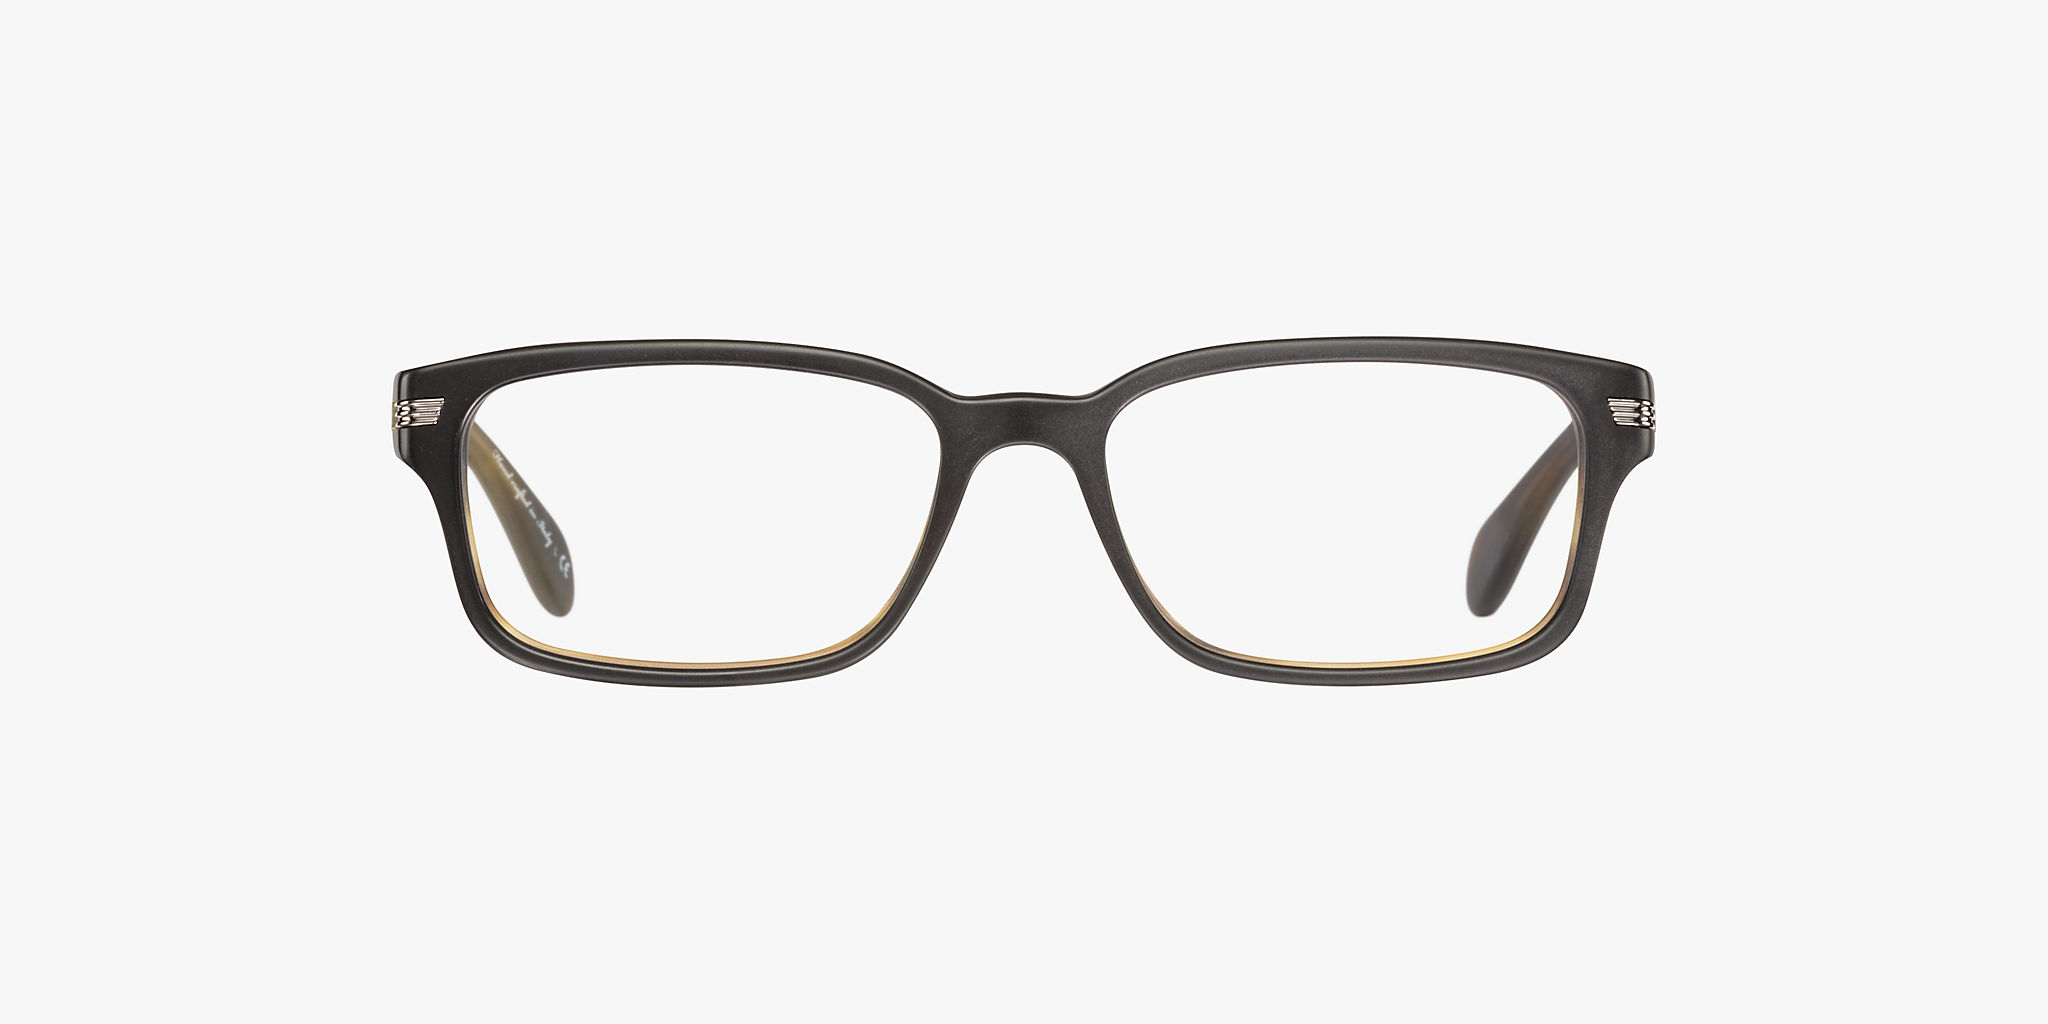 d282f0d4e4007 Optical OV5173 - Matte Black olive Tortoise - Demo Lens - Acetate ...